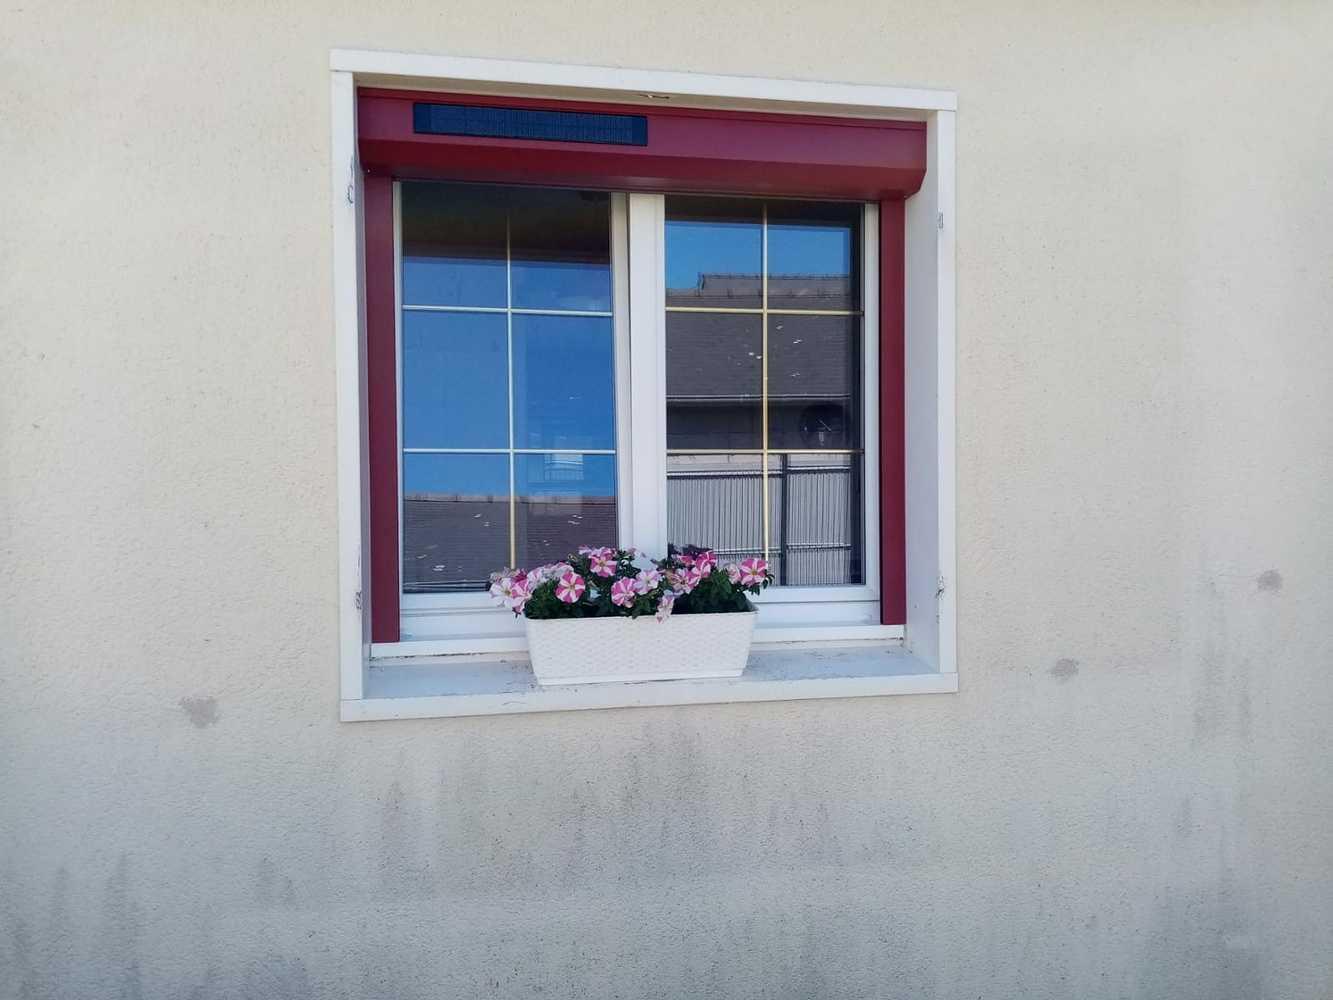 Installation fenêtres aluminium - volets solaires motorisés 0